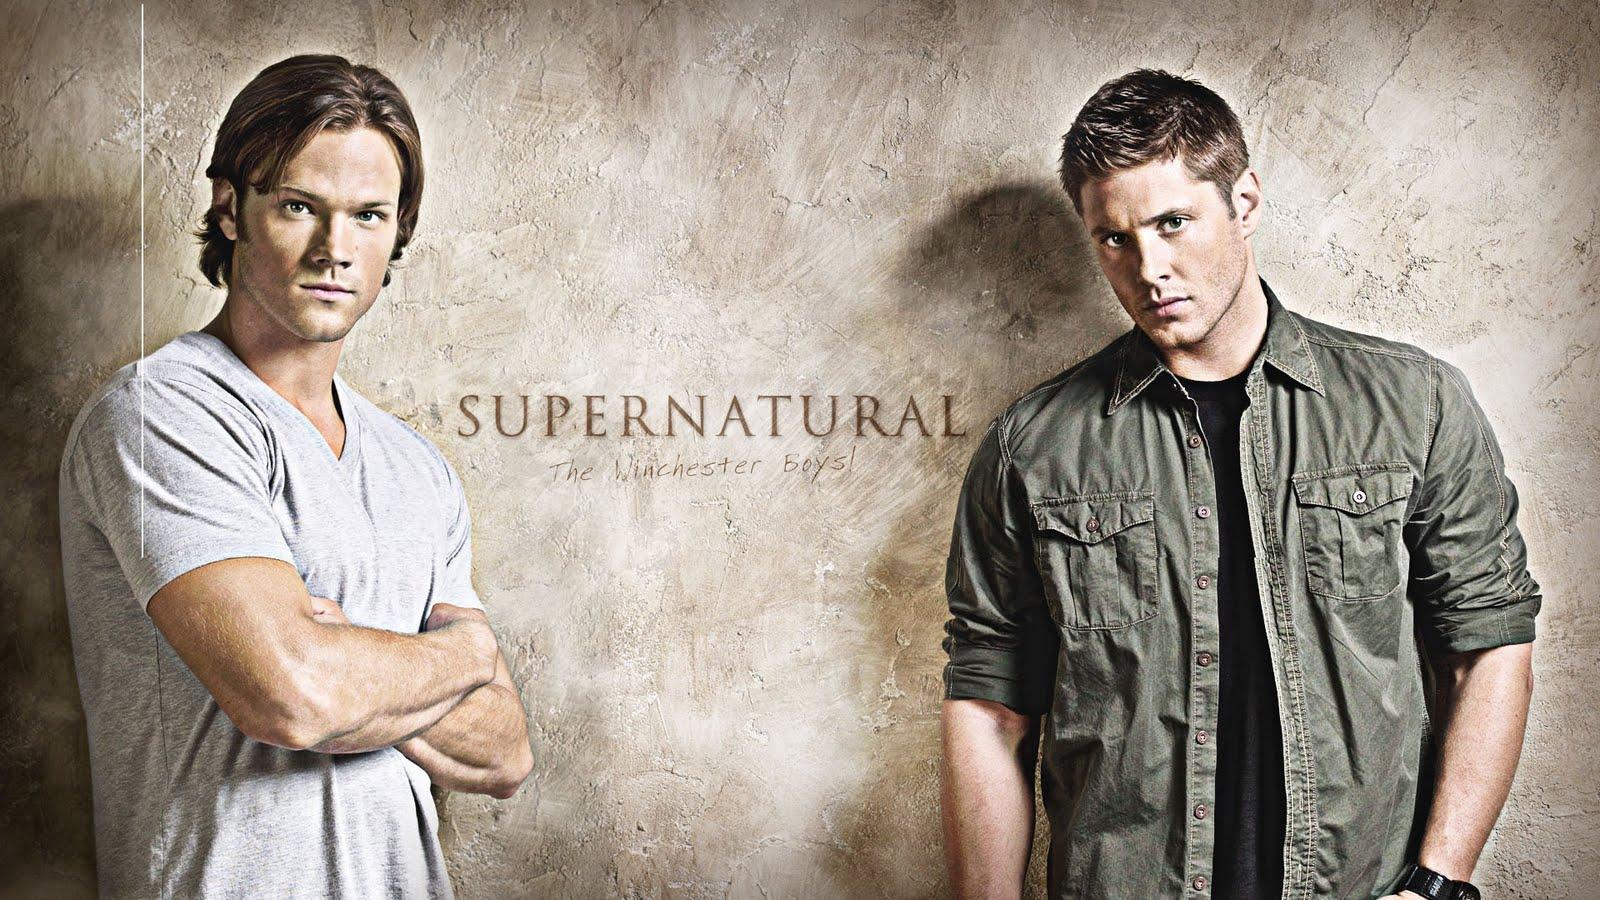 Supernatural: Theme Song (Supernatural - Carry On My Wayward